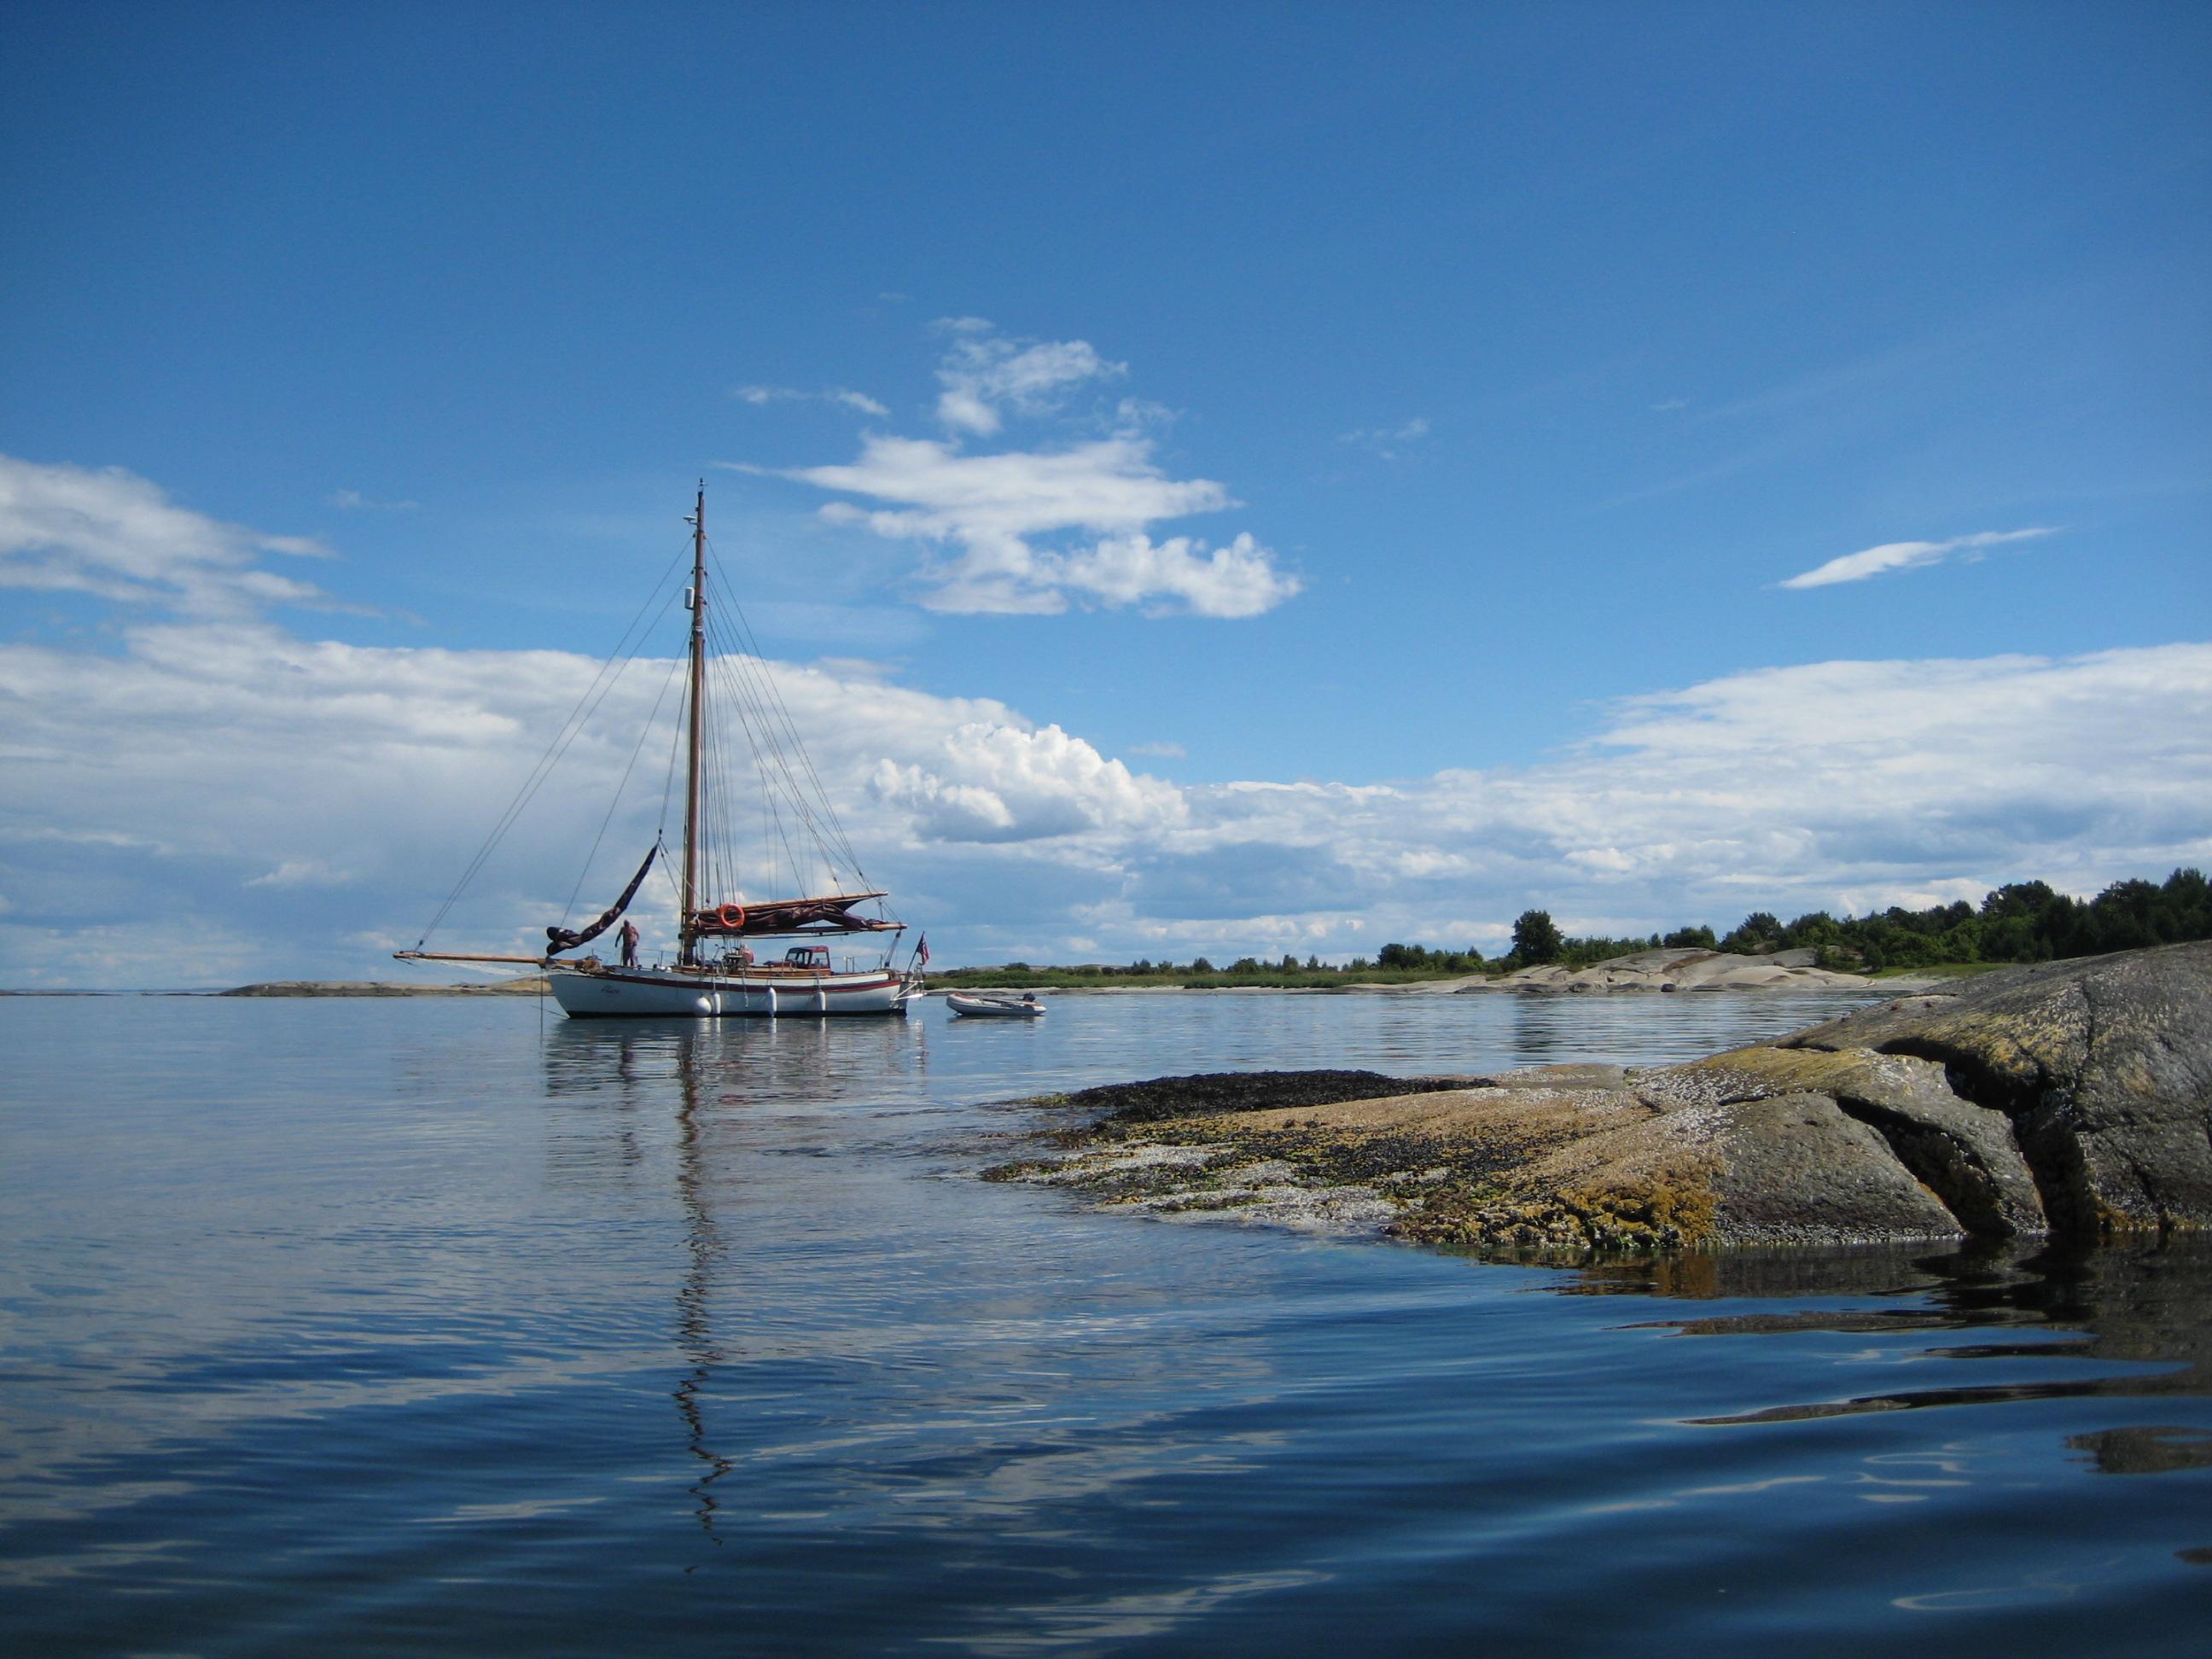 Sandø